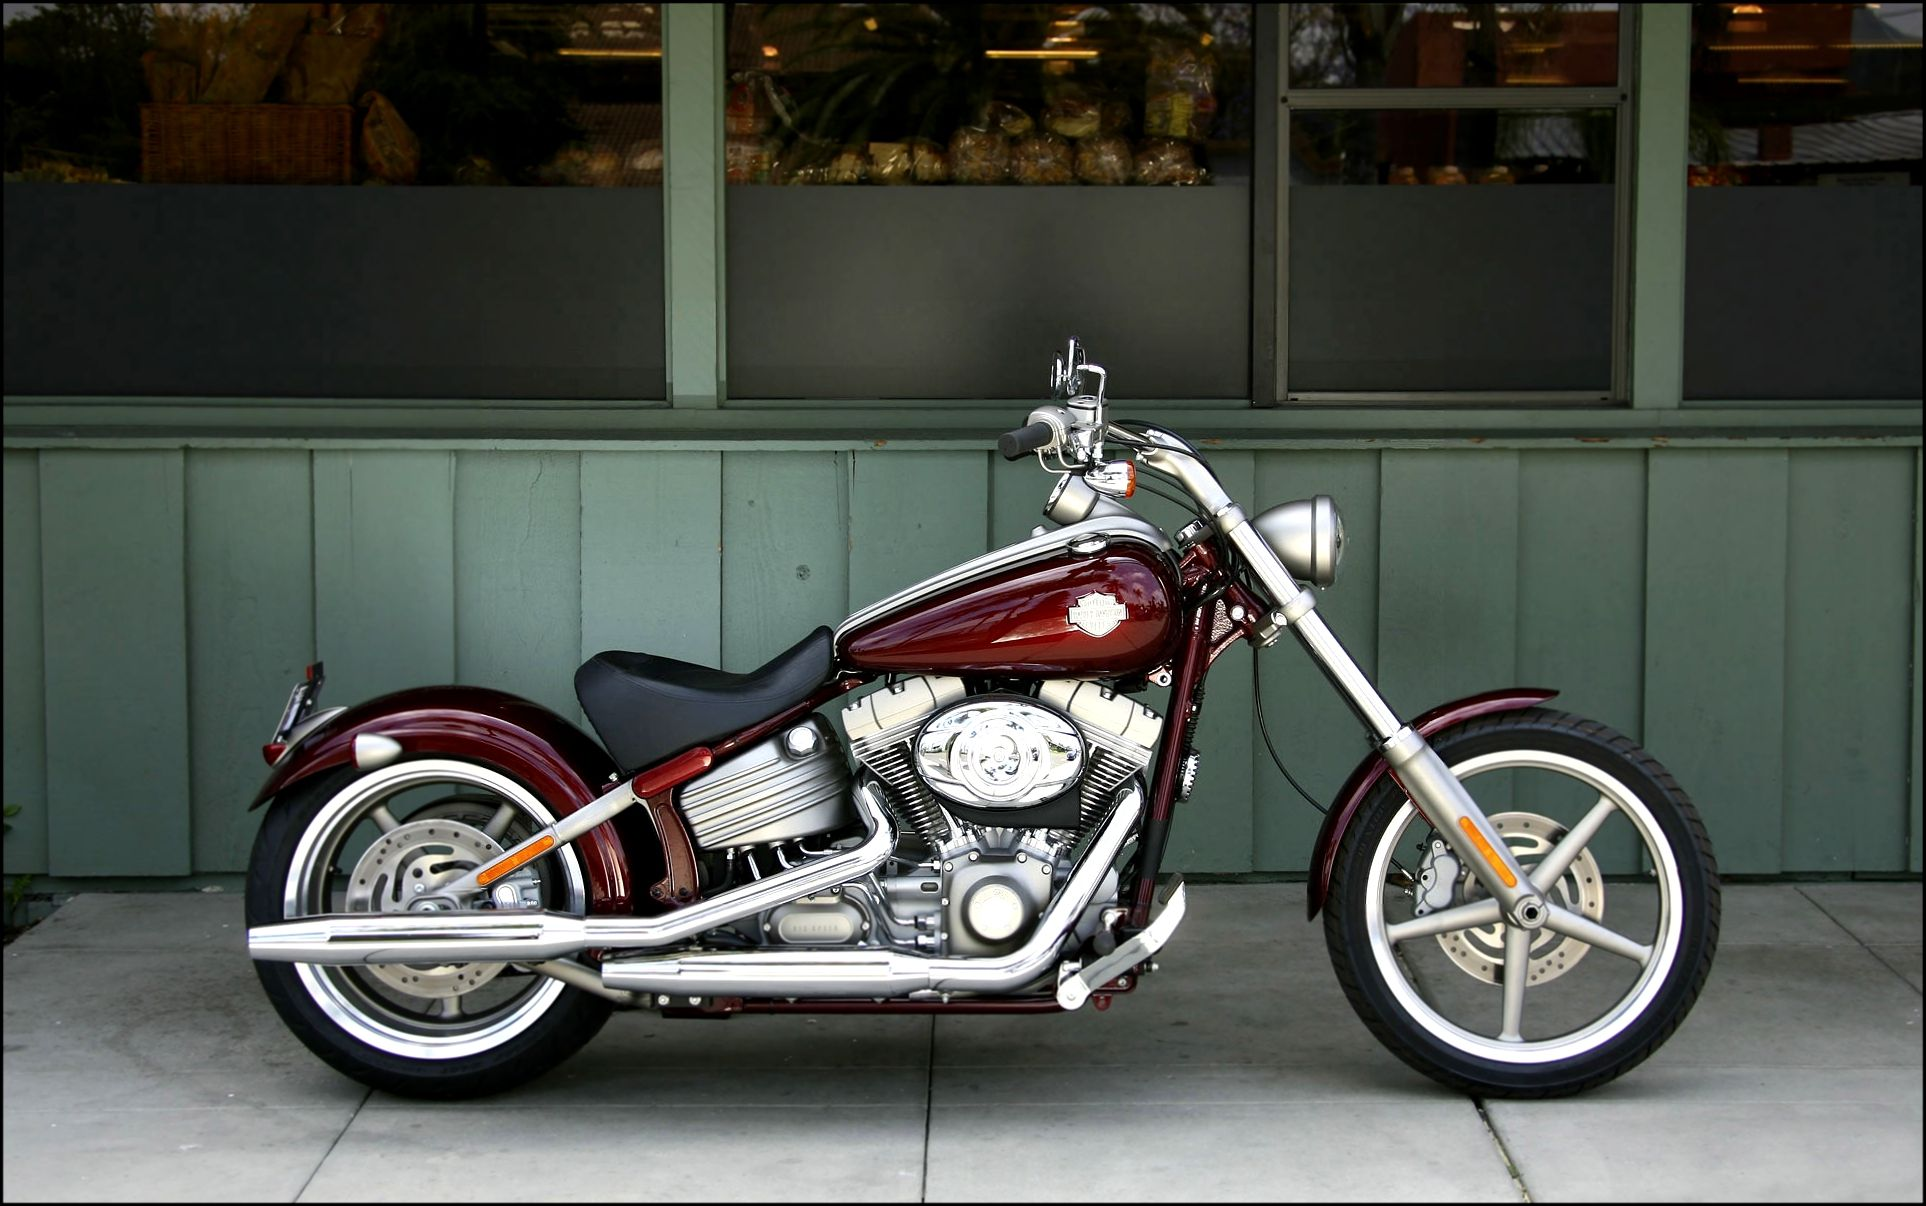 Harley Davidson Fxcwc Rocker C Softail | Harley Davidson motorcycles